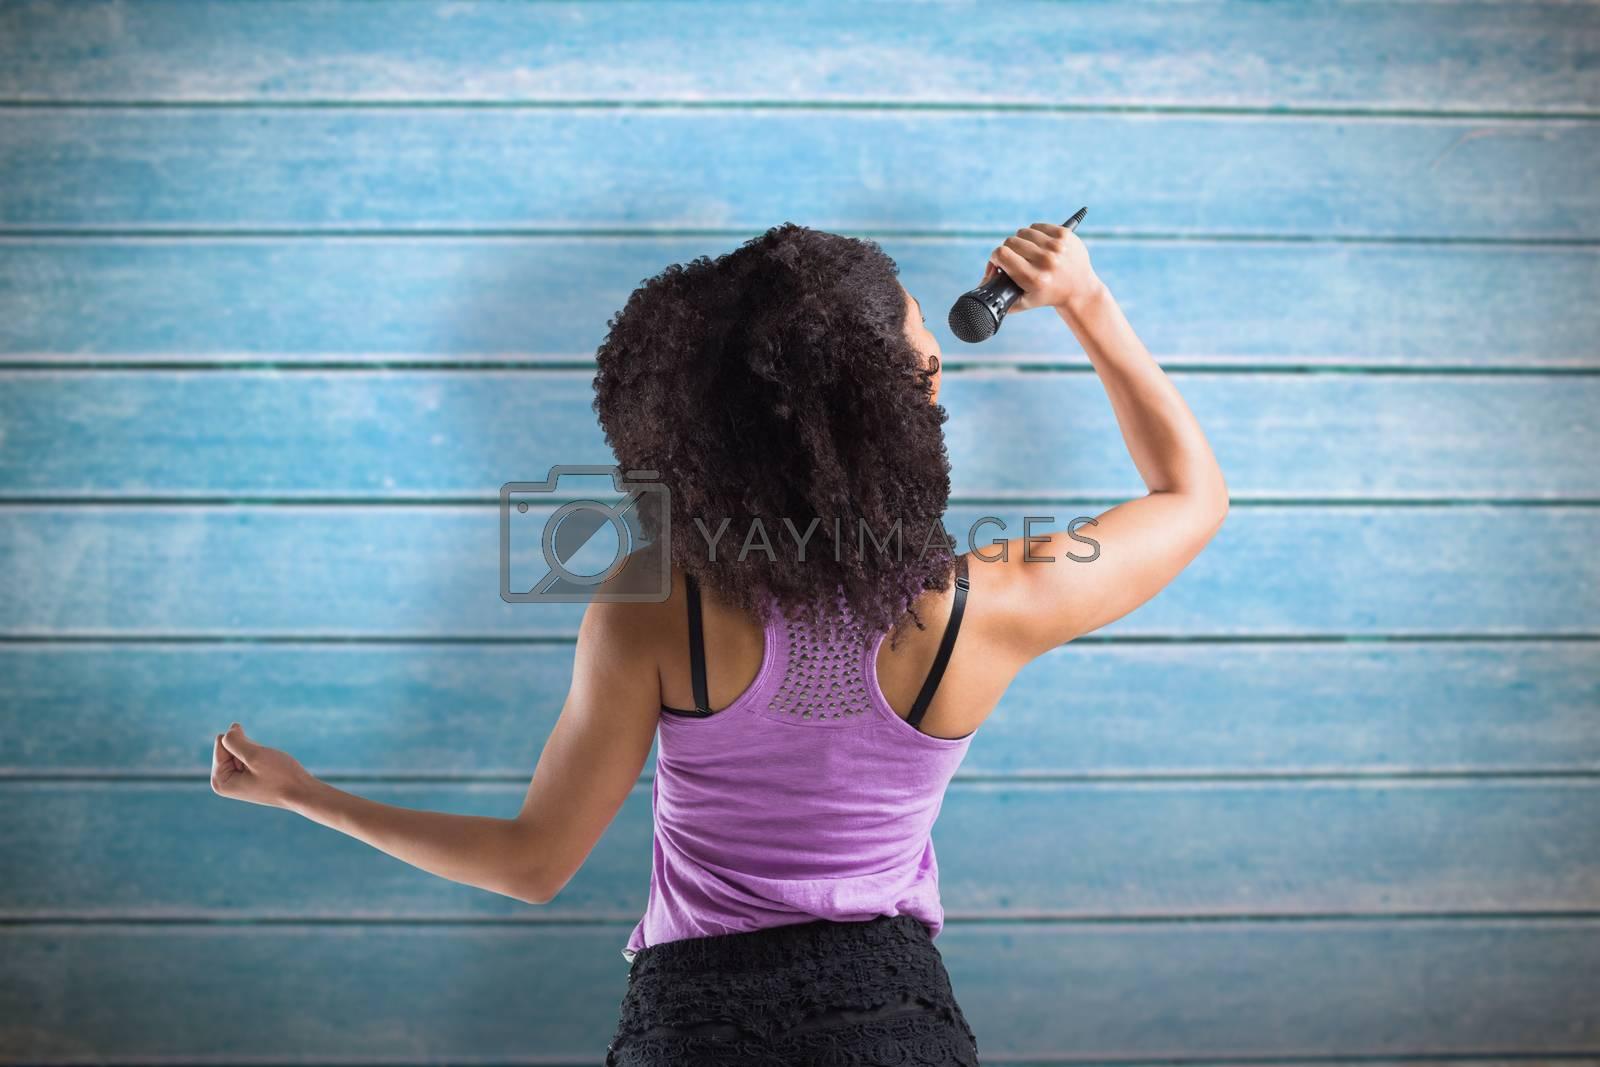 Pretty girl singing against wooden planks